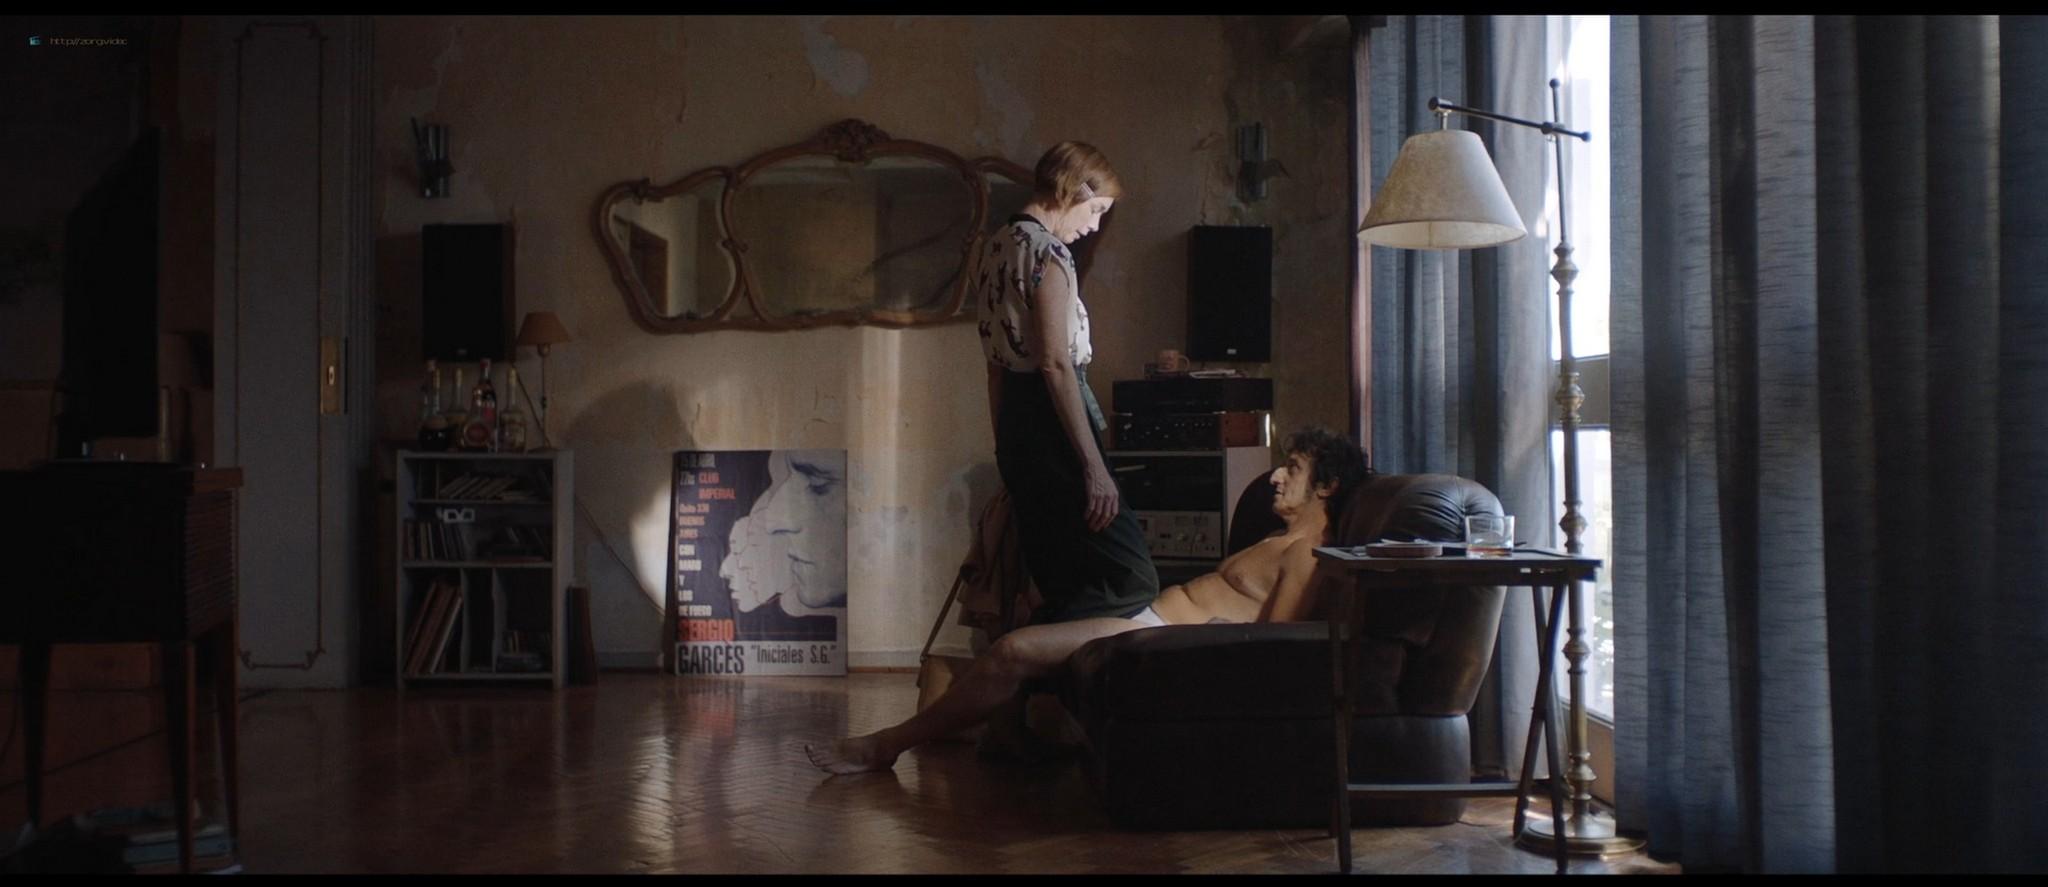 Julianne Nicholson nude sex Sabrina Alfonso nude too - Initials SG (AR-2019) HD 1080p Web (12)